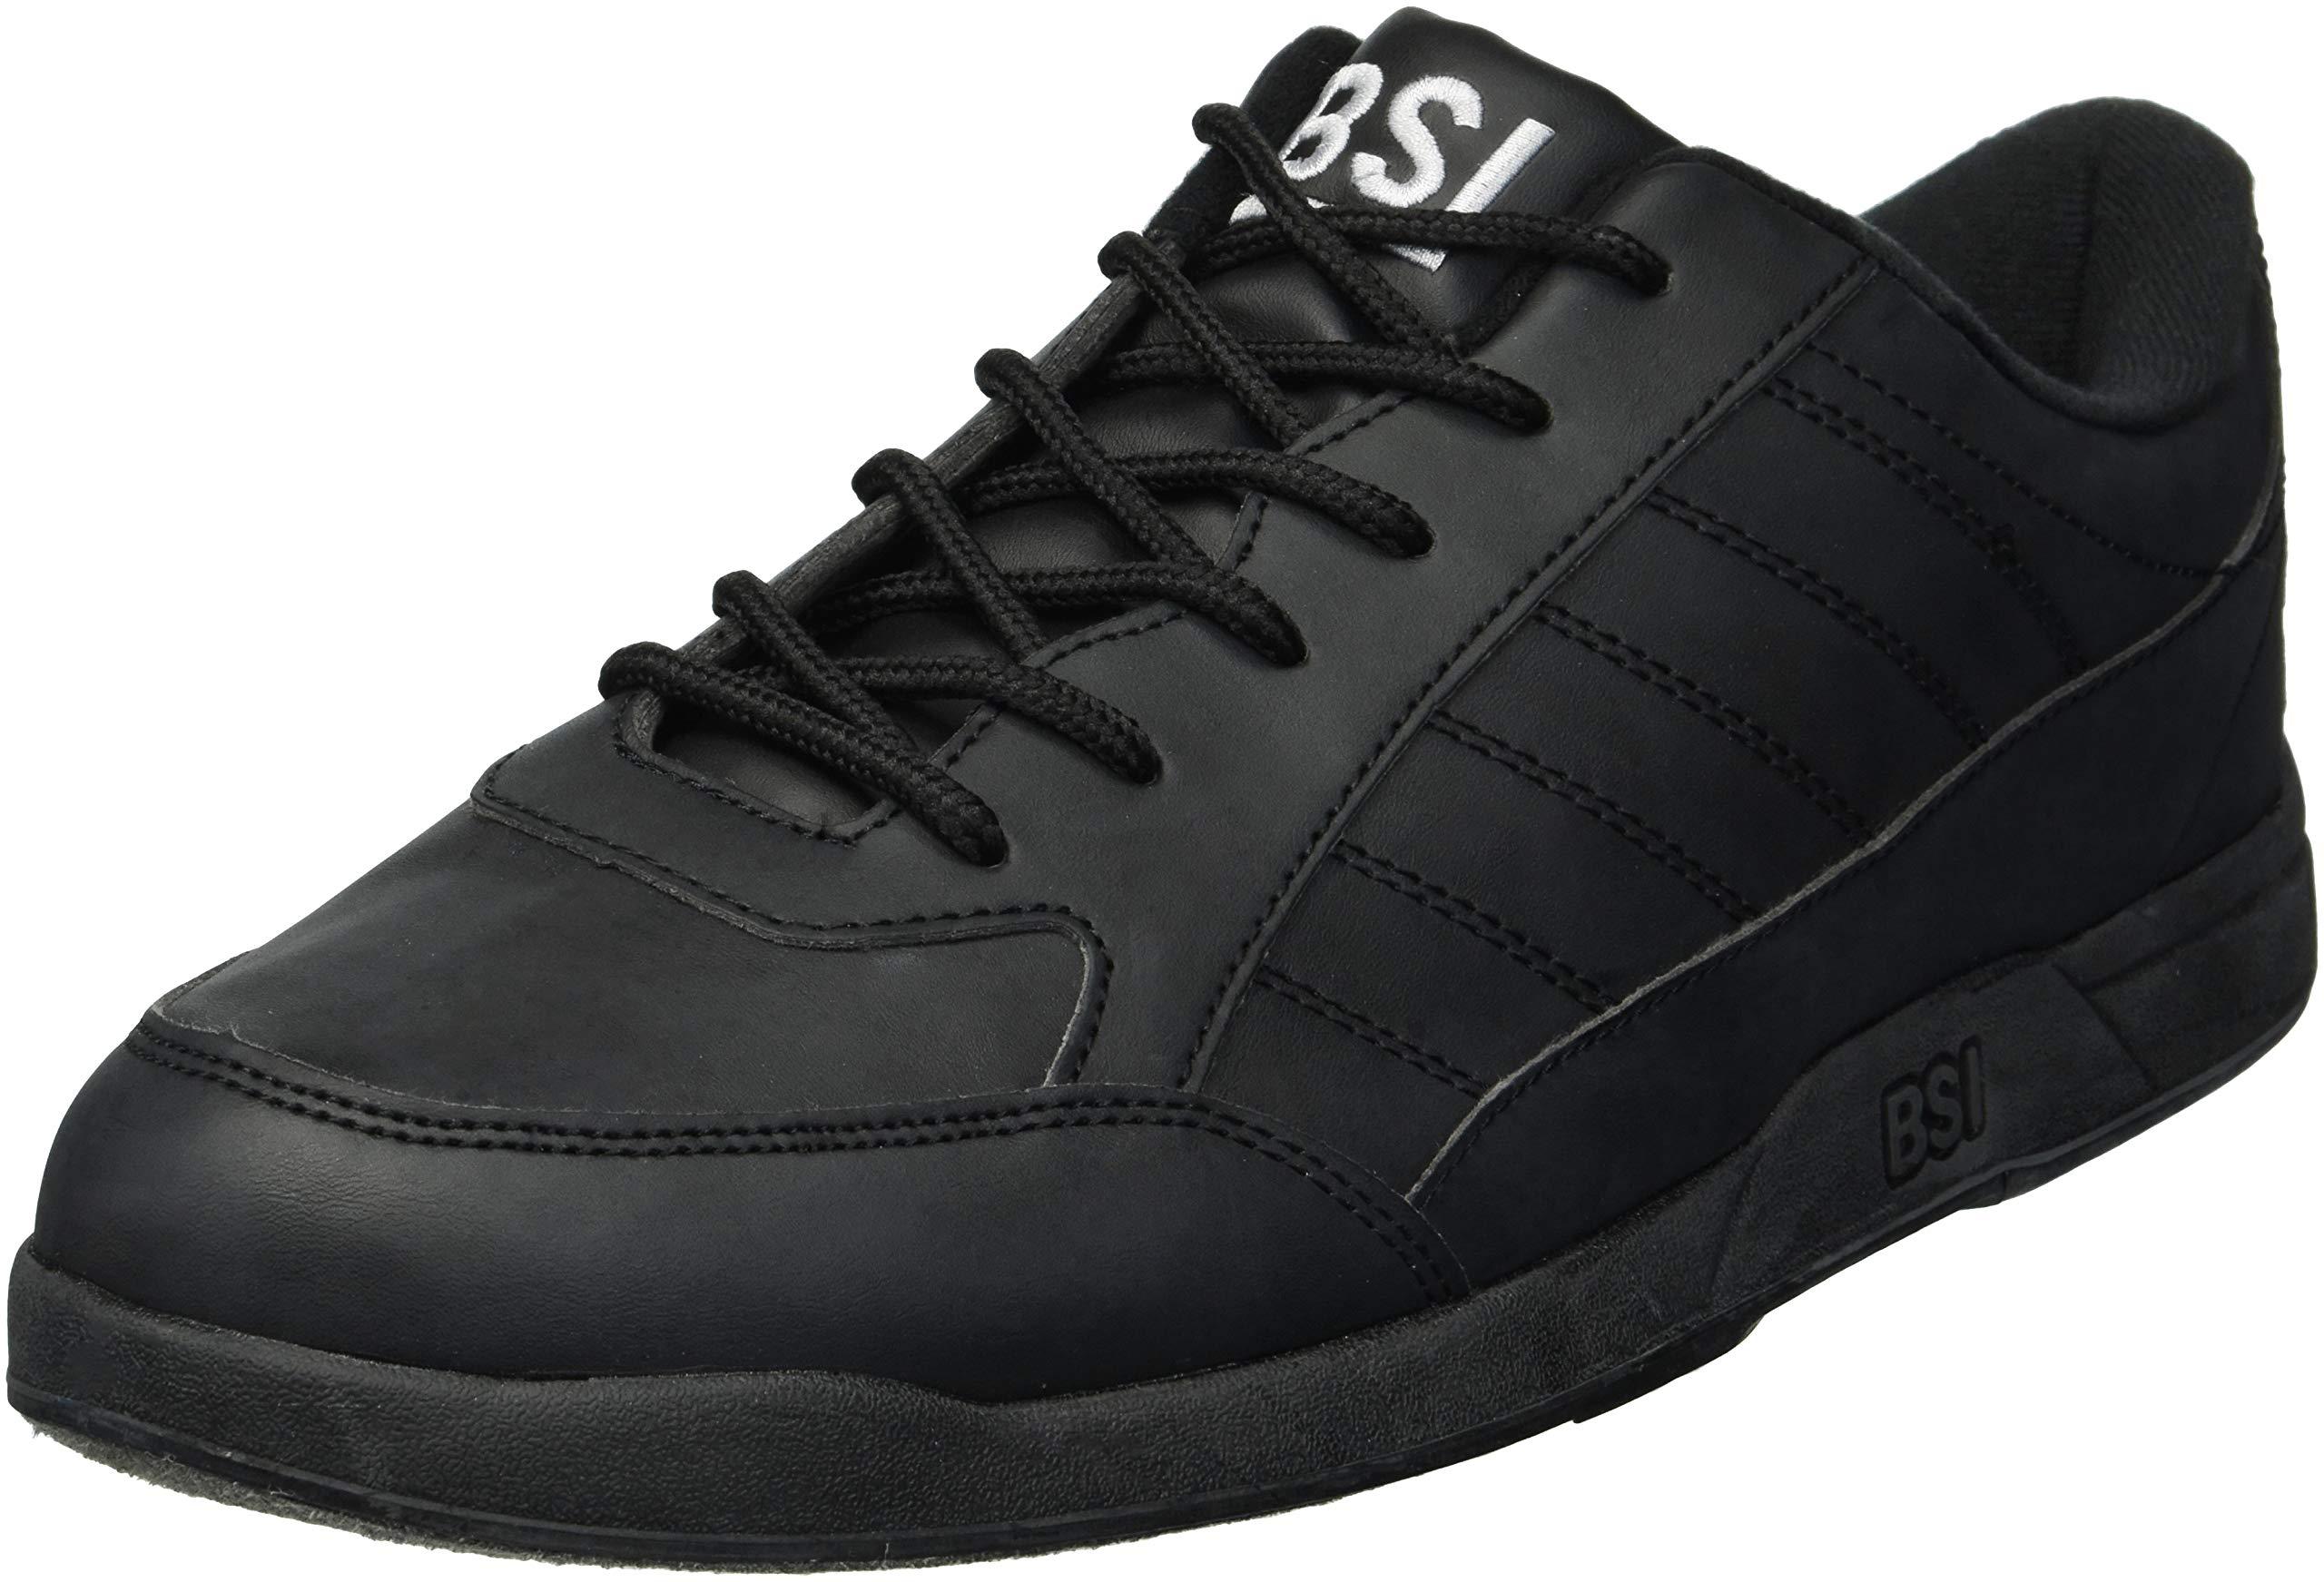 BSI Men's Basic #521 Bowling Shoes, Black, Size 6.5